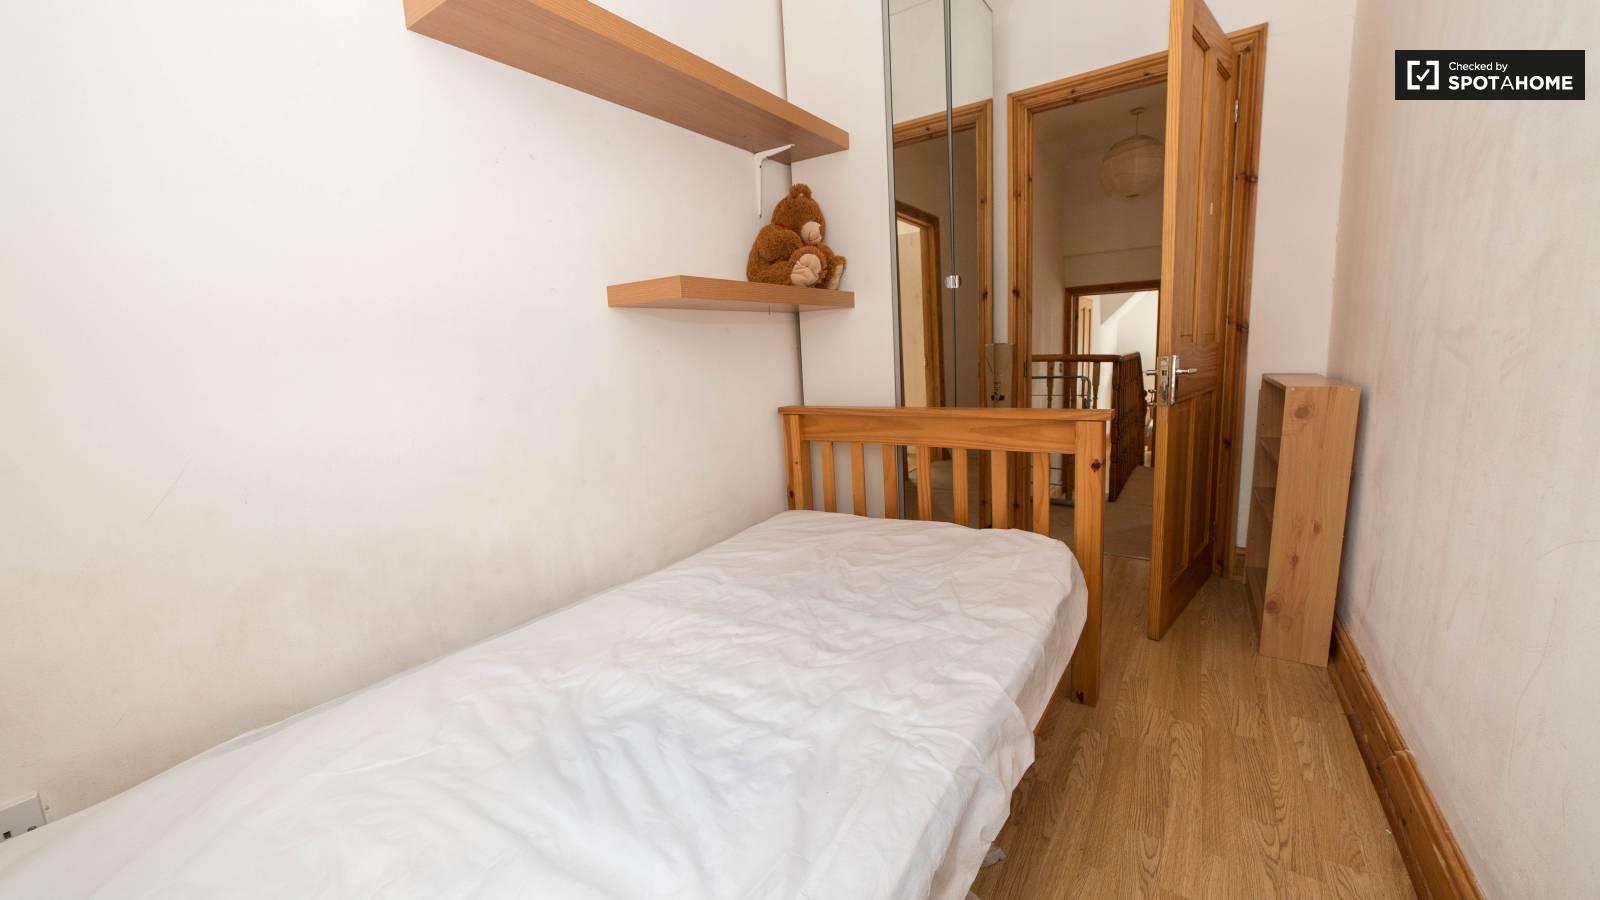 Bedroom B2